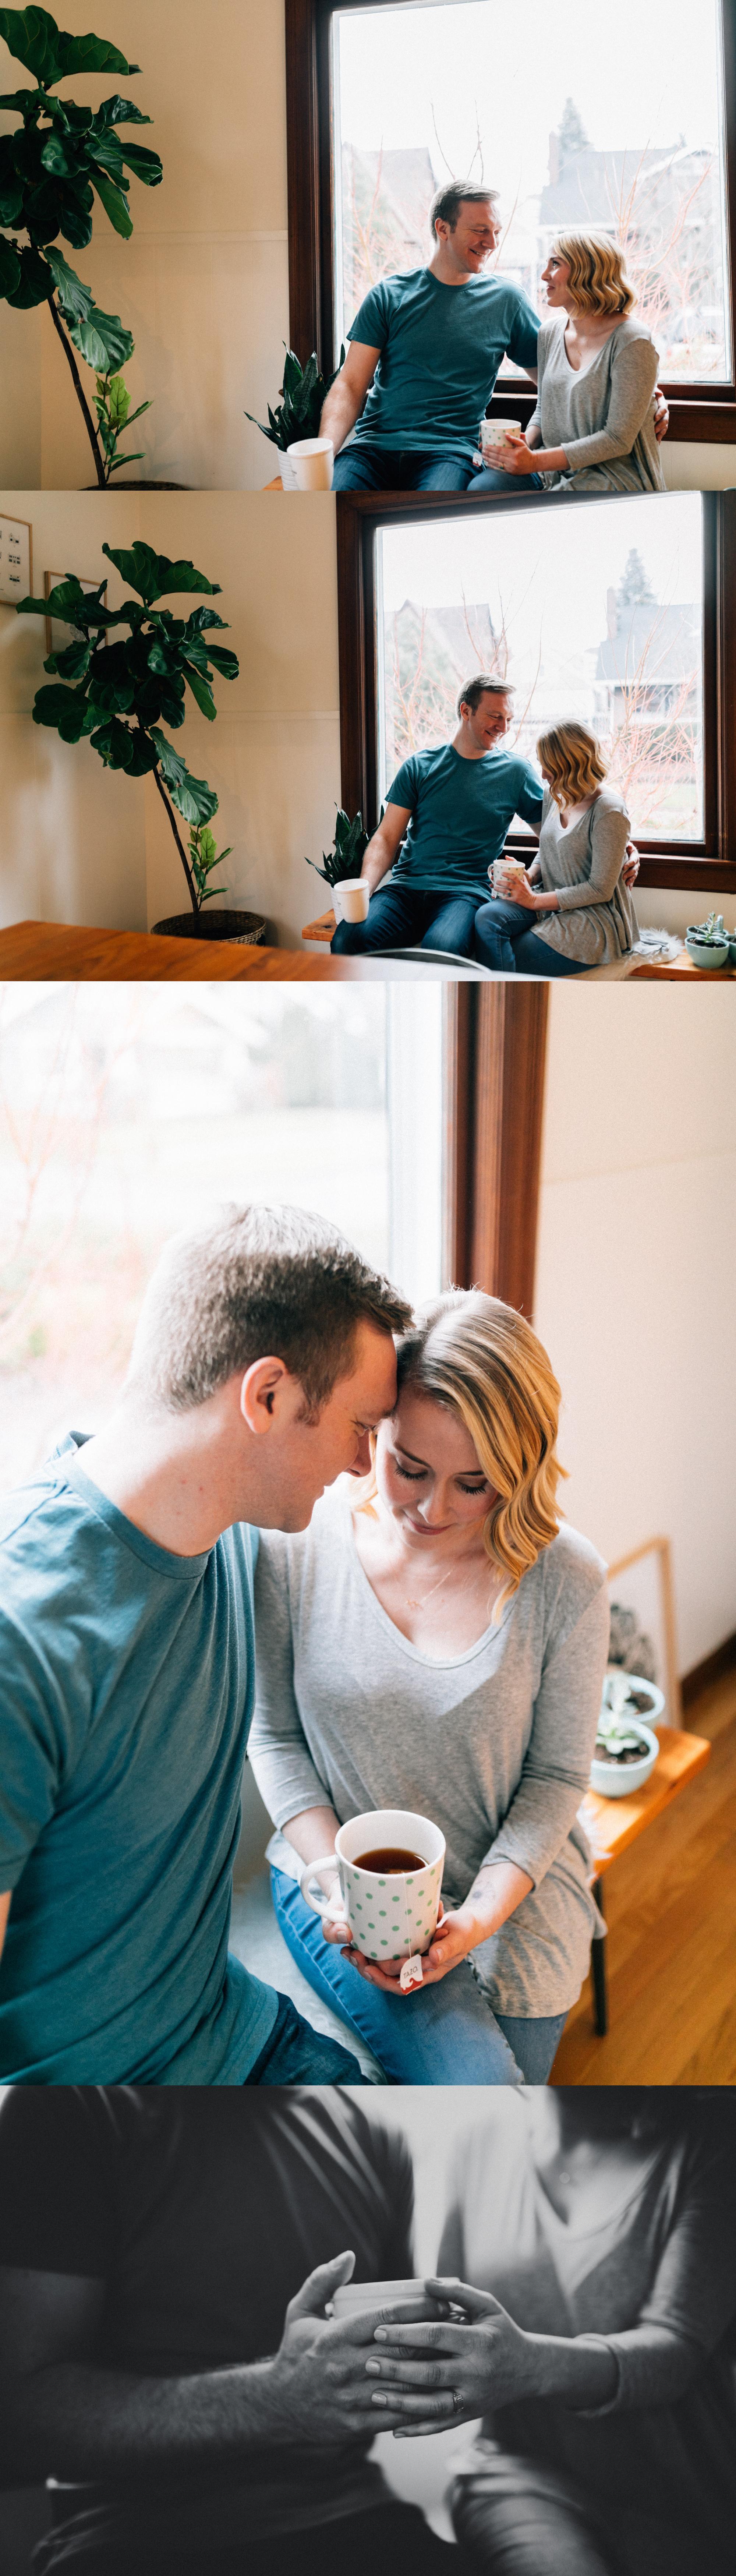 seattle in home engagement lifestyle couples photos wedding photographer washington pnw-11.jpg